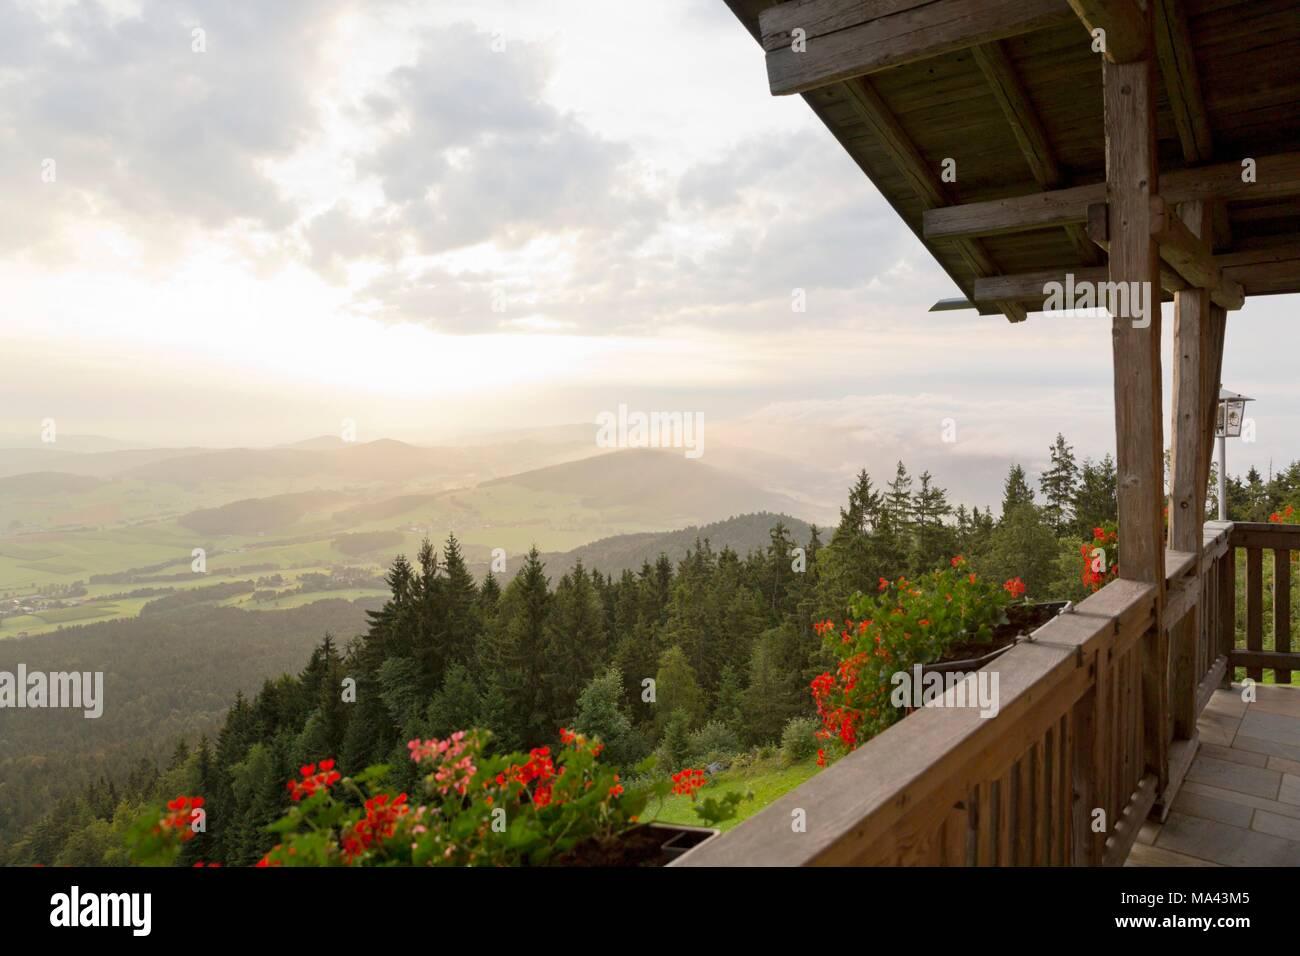 The mountain guesthouse on the Hohenbogen mountain range in Neukirchen beim Heiligen Blut in the Bavarian Forest, Germany - Stock Image